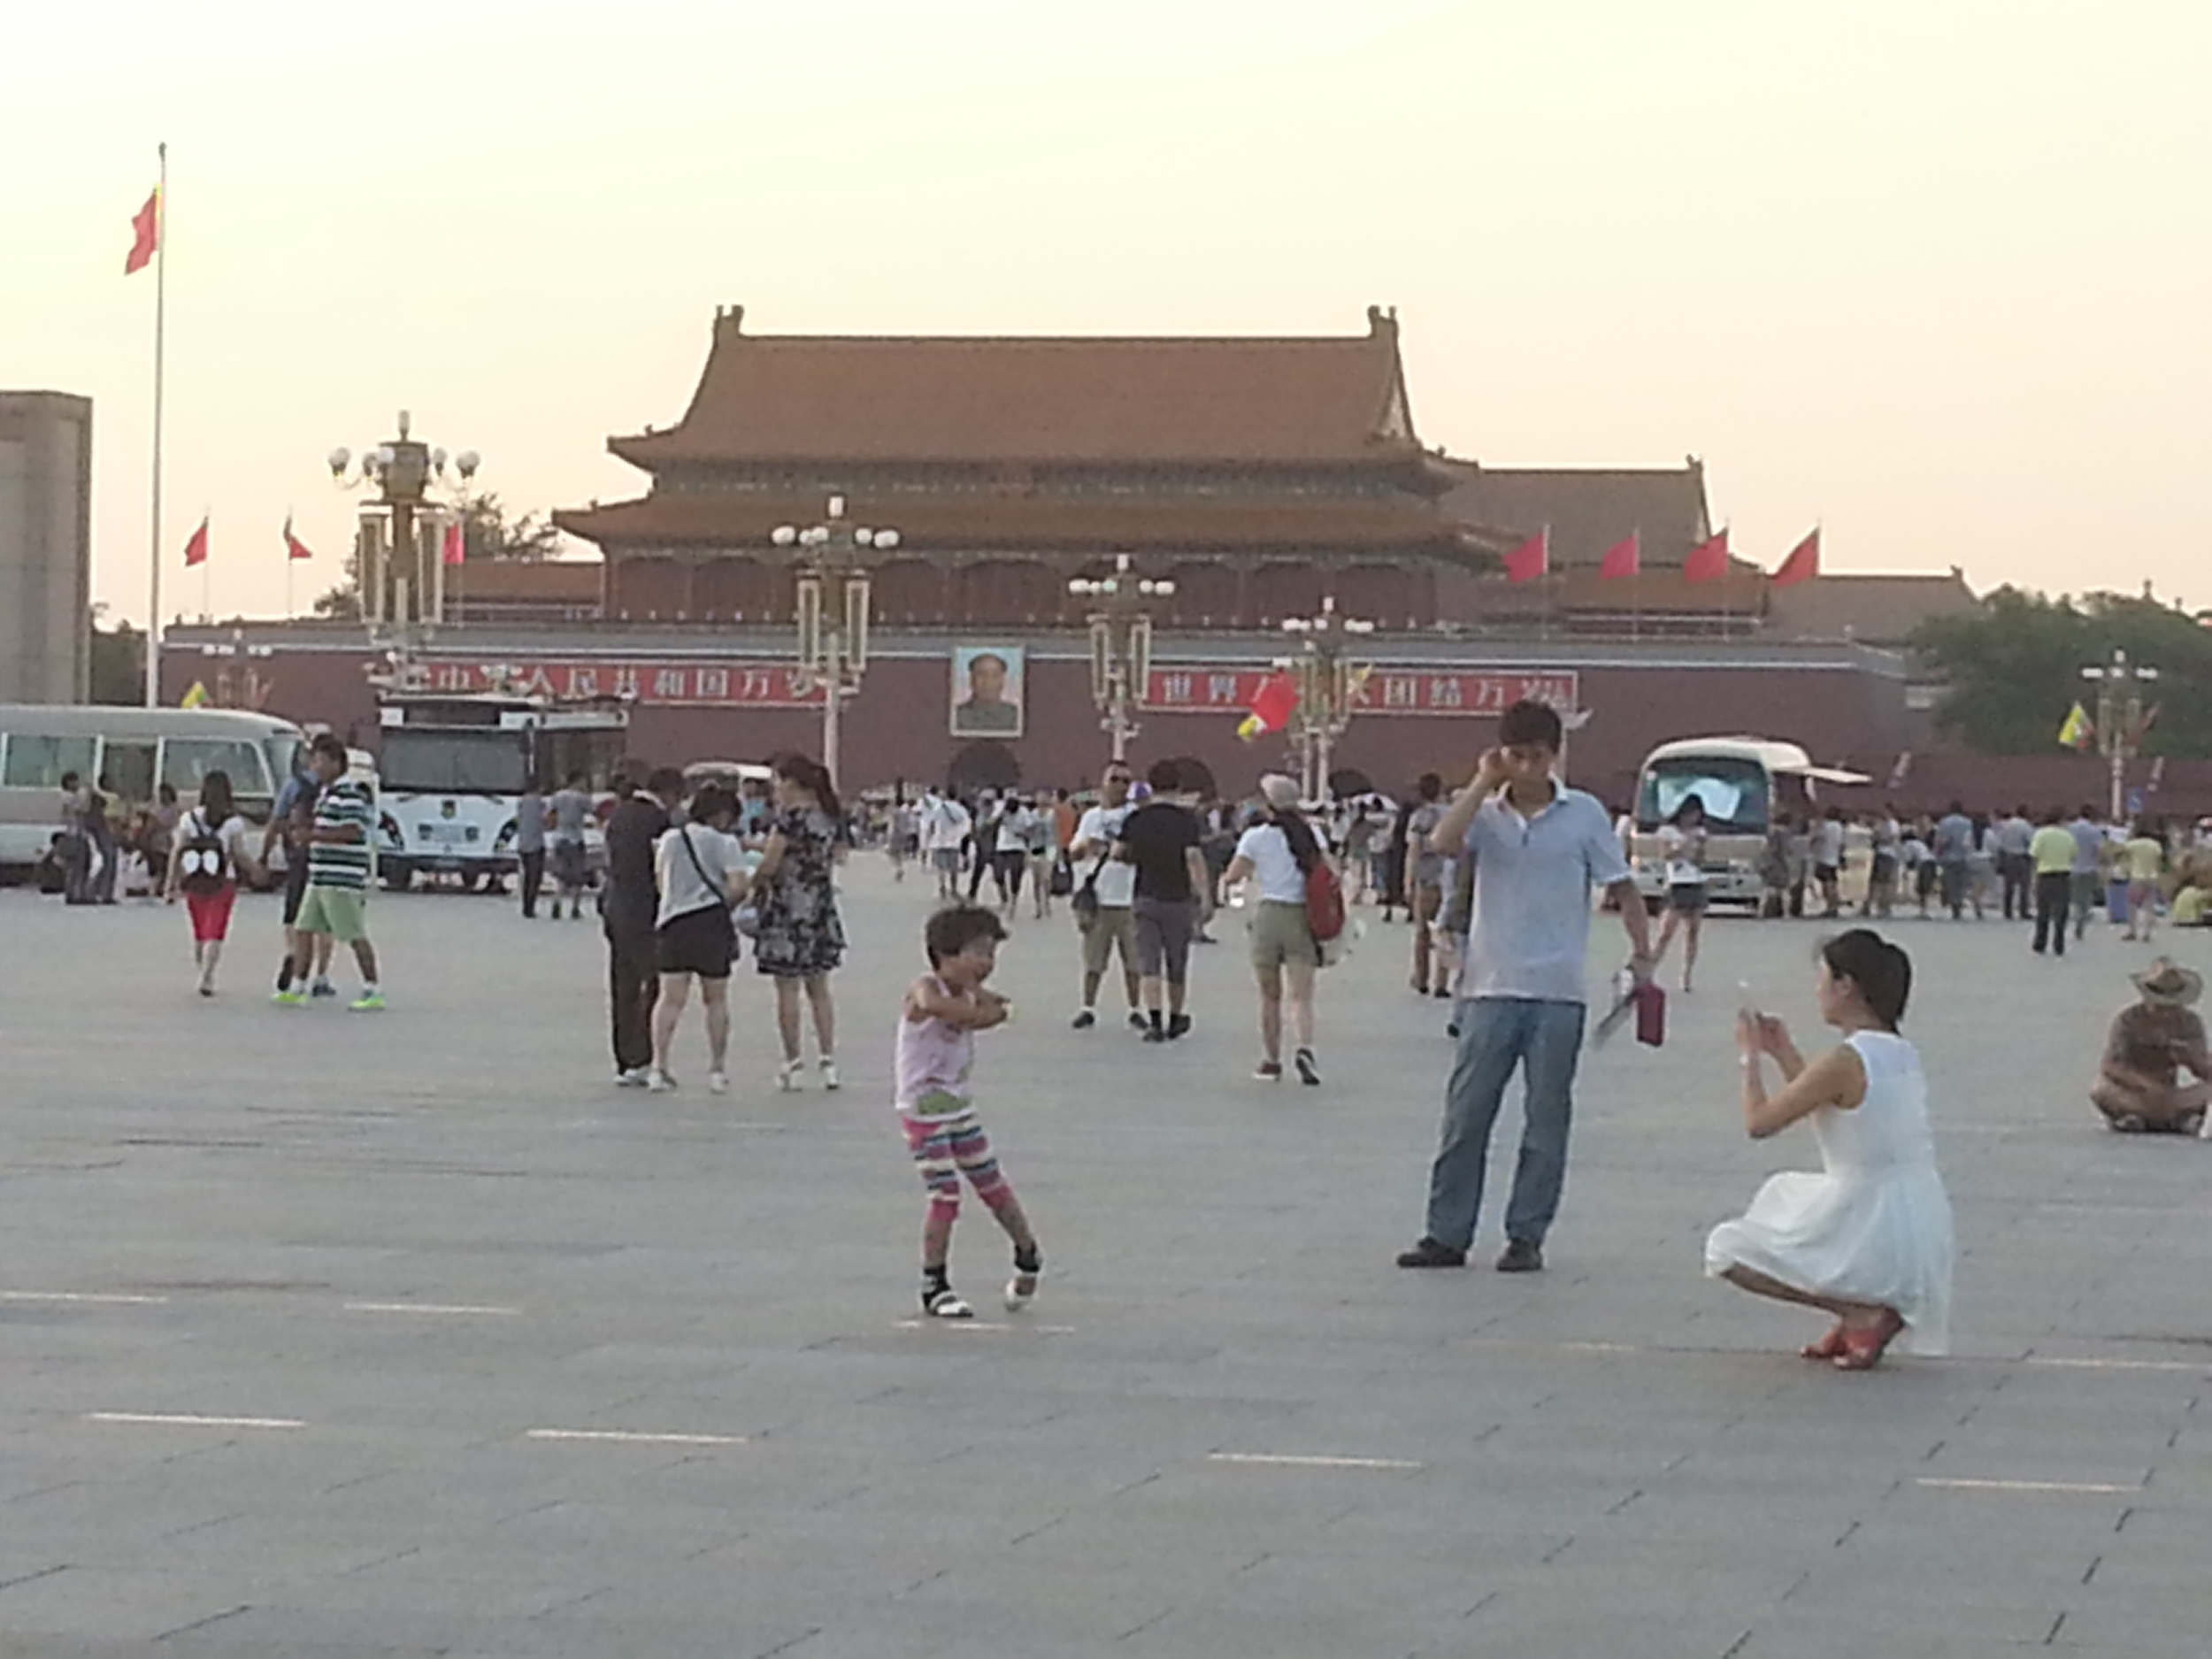 Sunset at Tiananmen Square